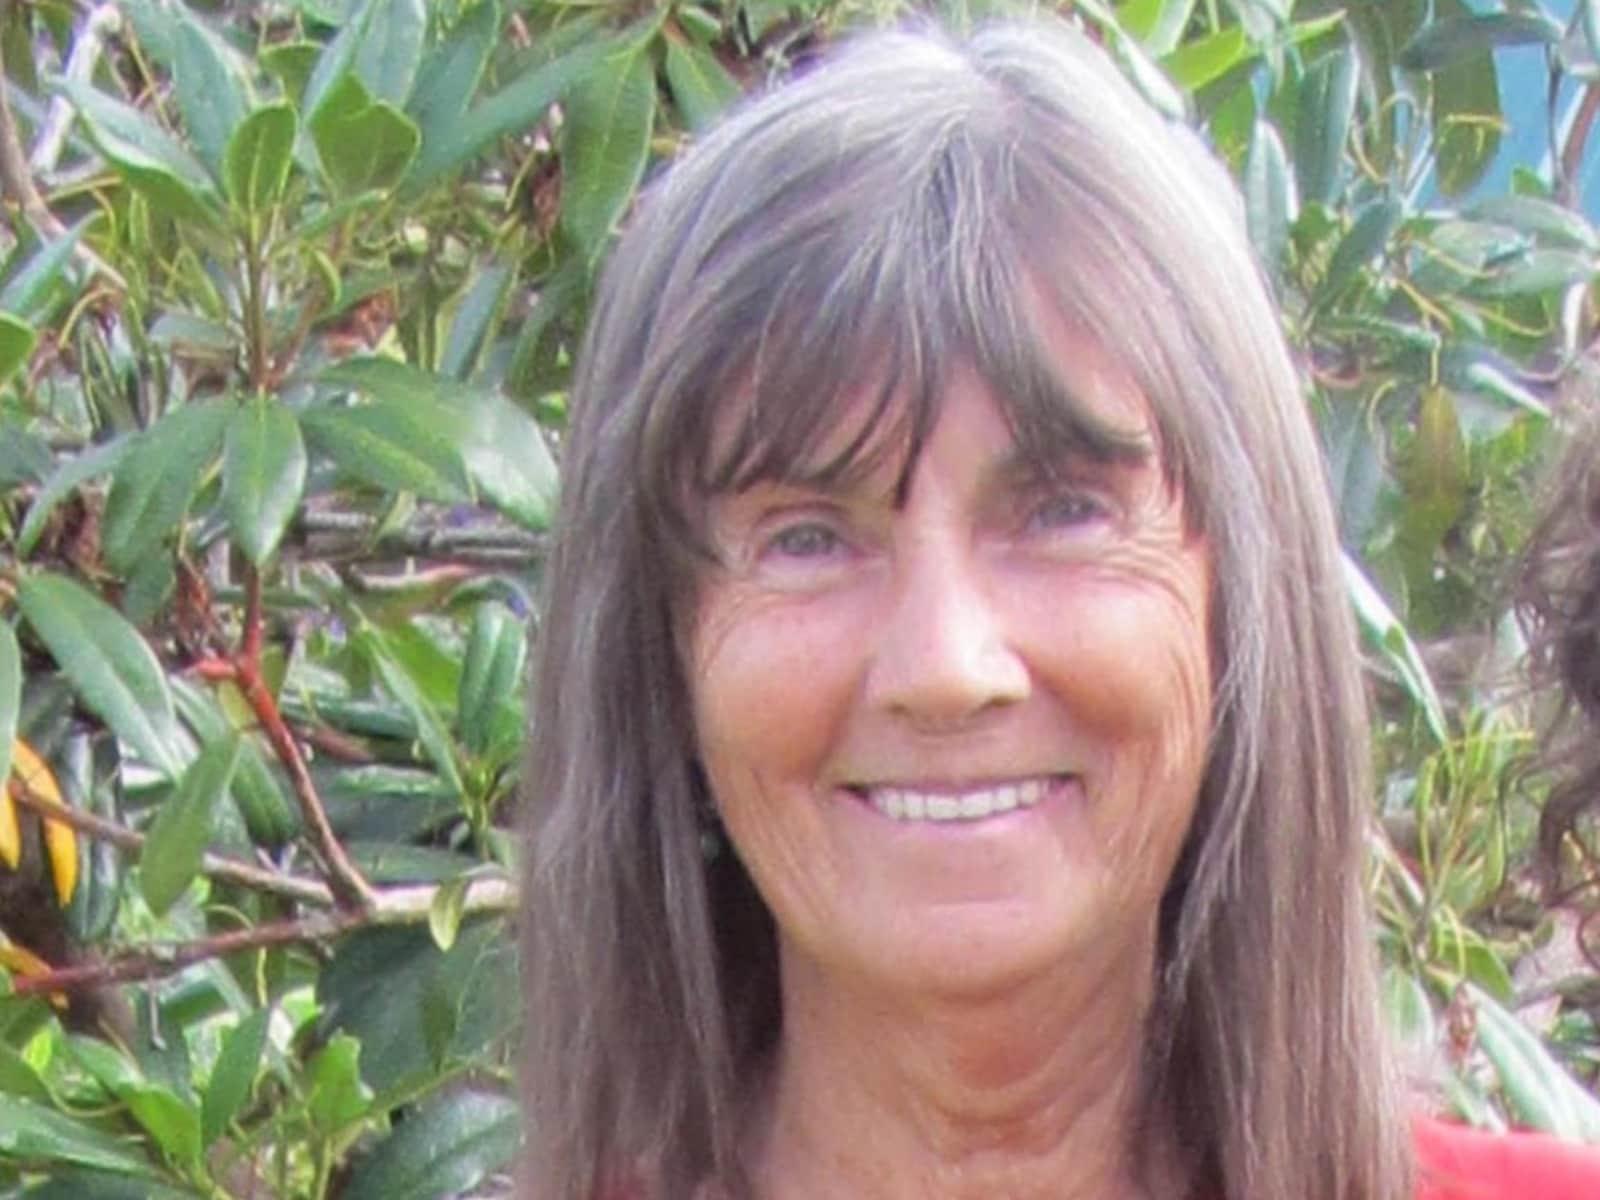 Maureen from Courtenay, British Columbia, Canada